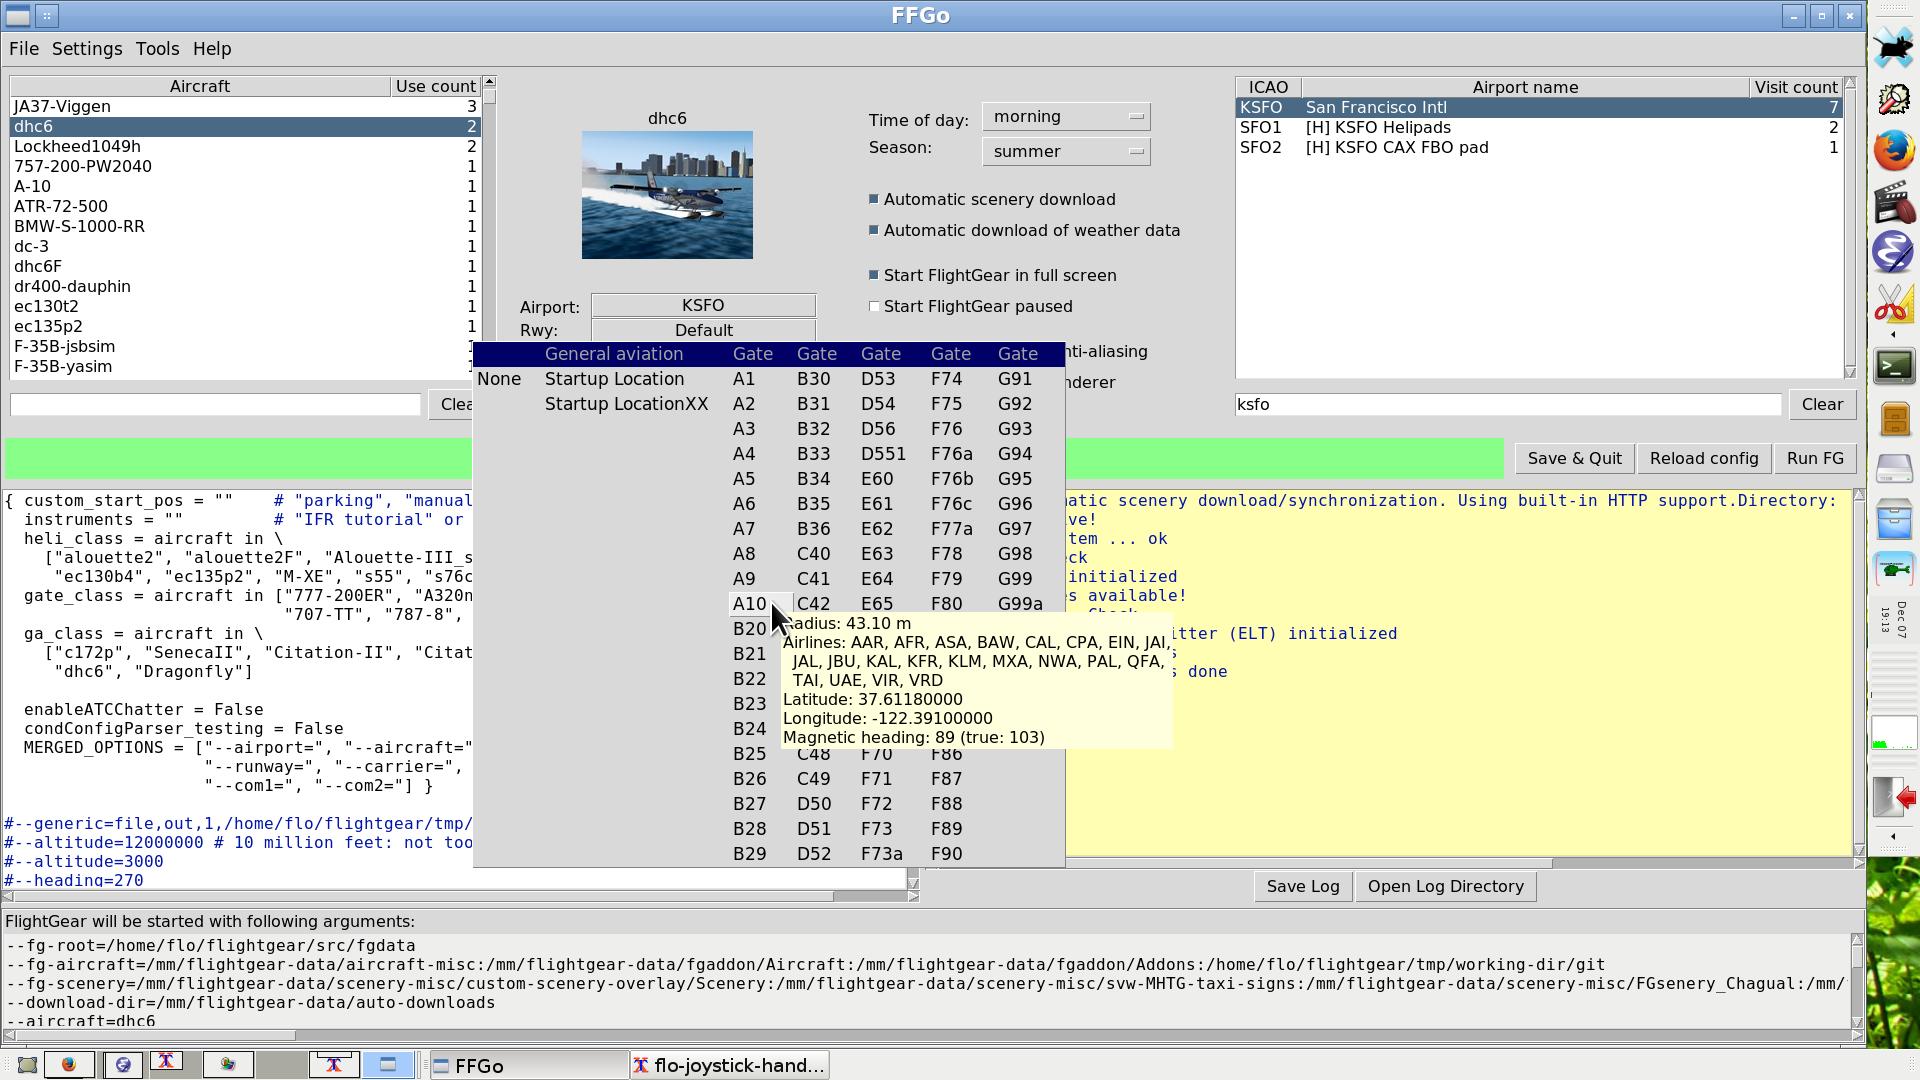 FFGo Screenshots